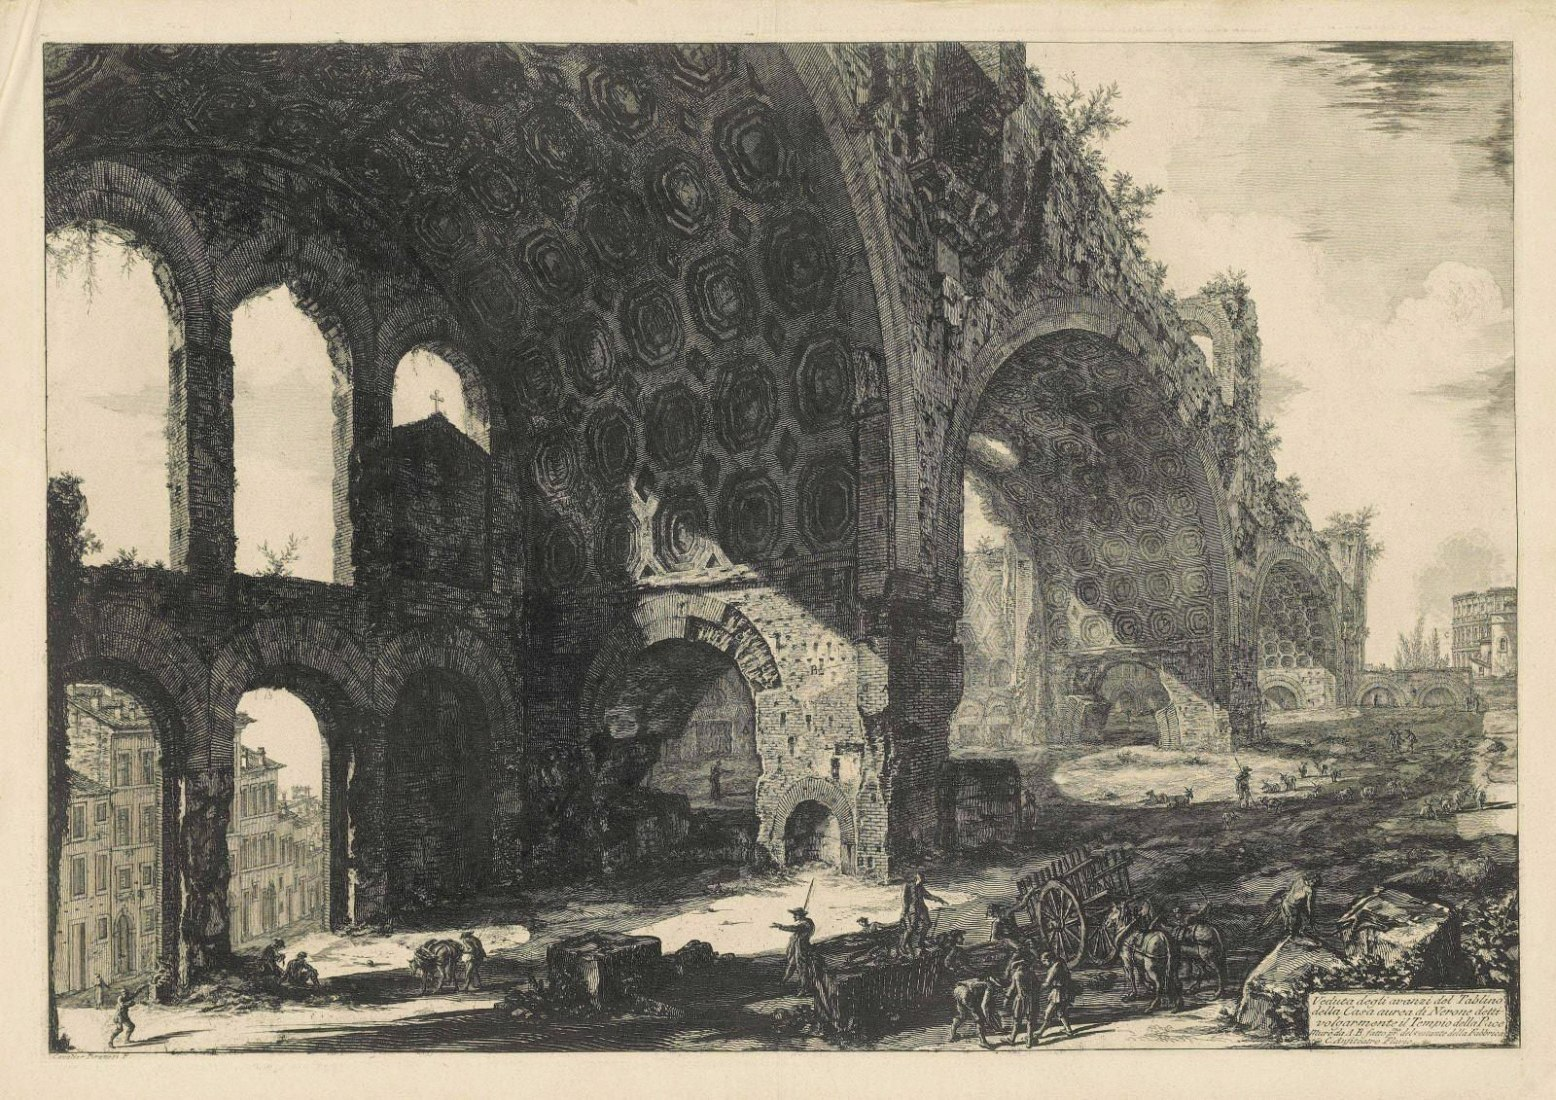 Giovanni Battista Piranesi, The Basilica of Maxentius, 1774, Museum Boijmans Van Beuningen, Rotterdam